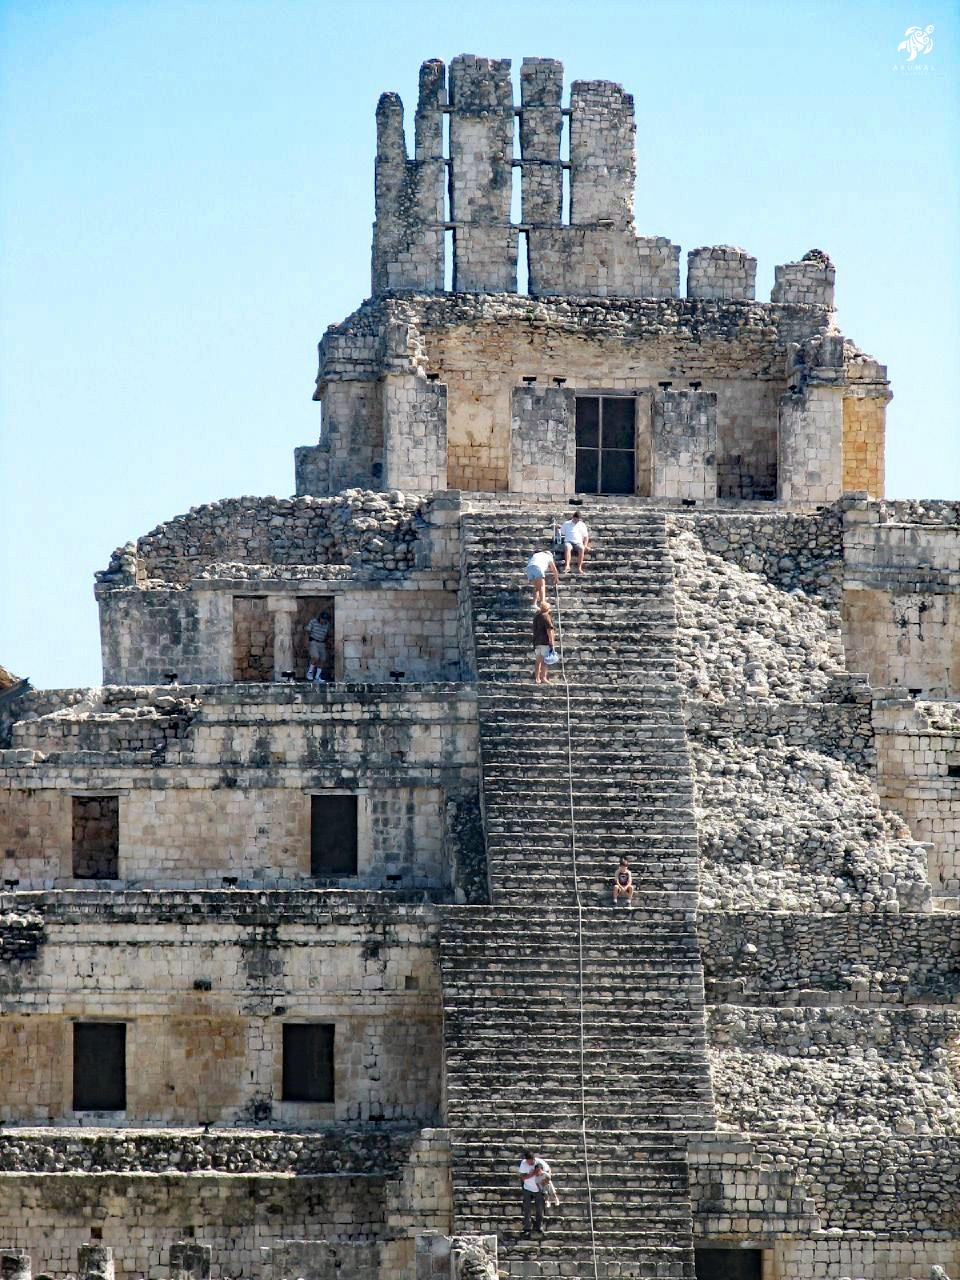 Climbing to the top of a Maya ruin